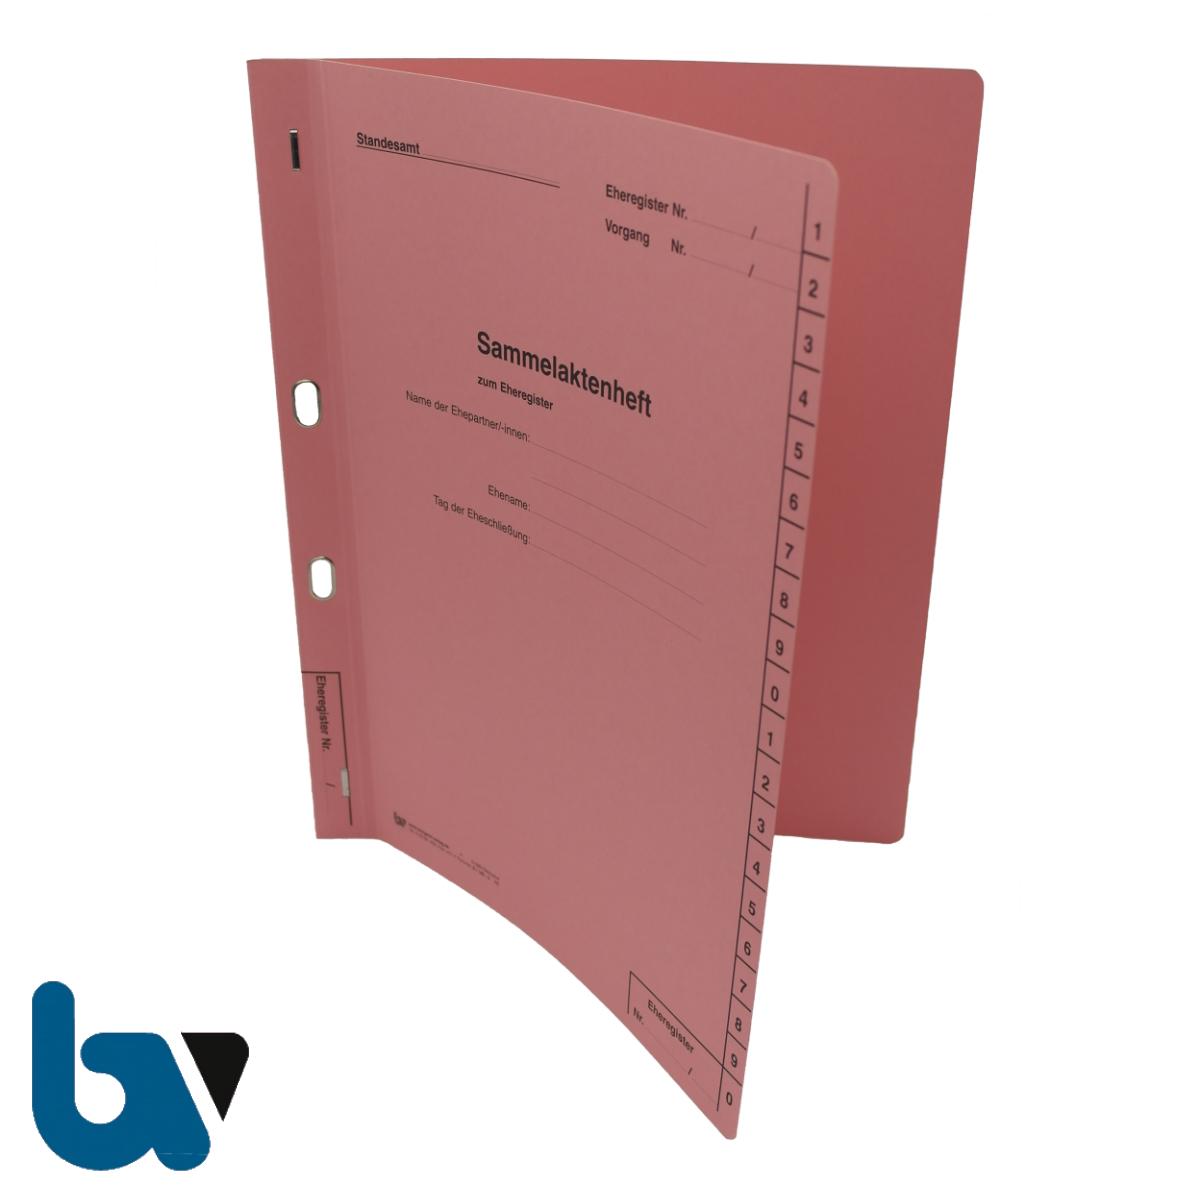 0/145-3 Sammelaktenheft Eheregister Ehepartner Eheschliessung Ovalöse beidseitig rosa Karton Außen | Borgard Verlag GmbH